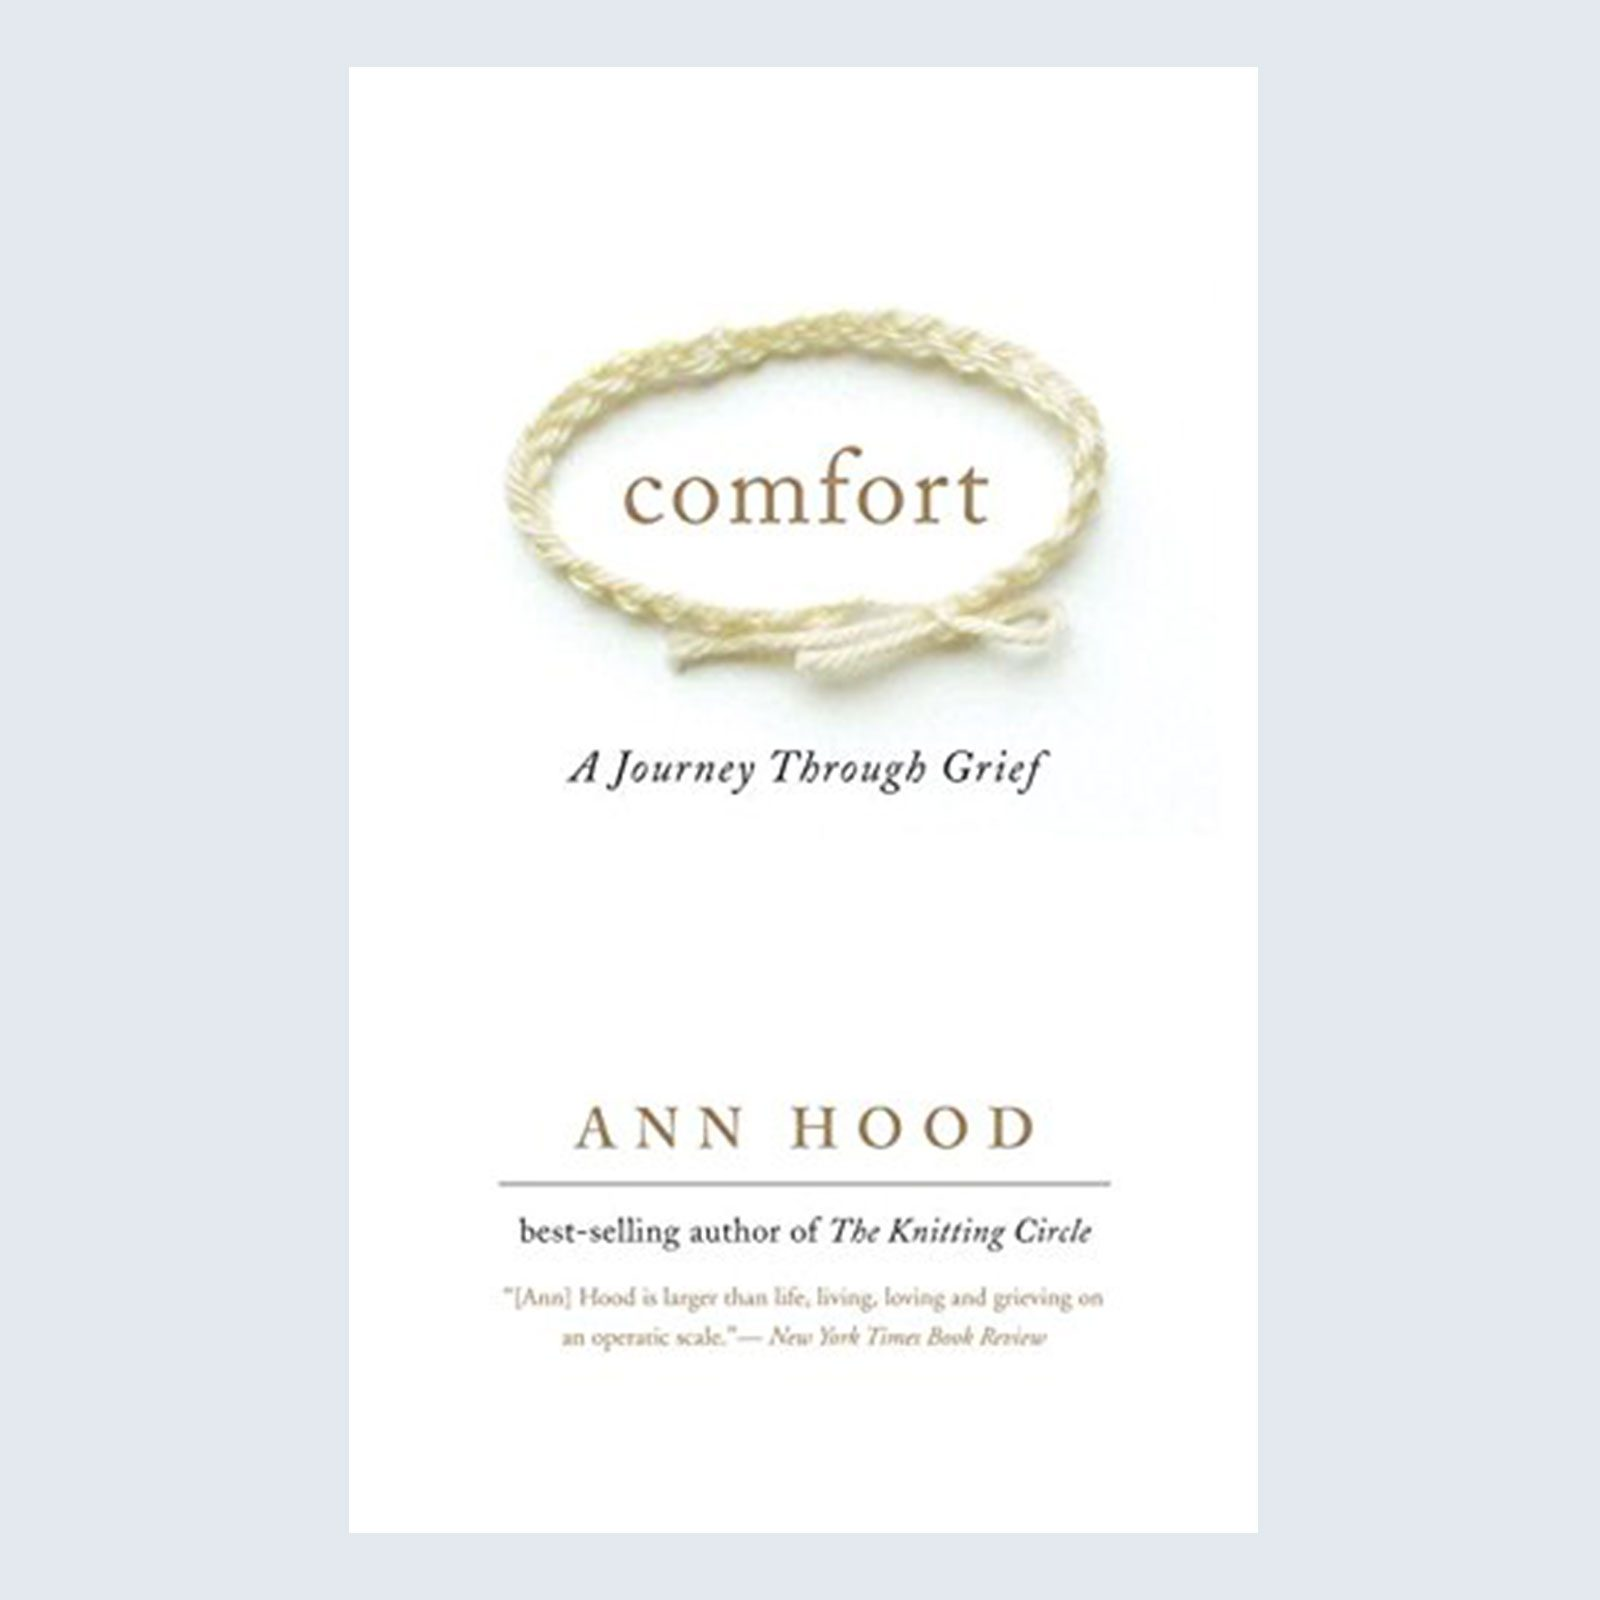 Comfort: A Journey Through Grief by Ann Hood